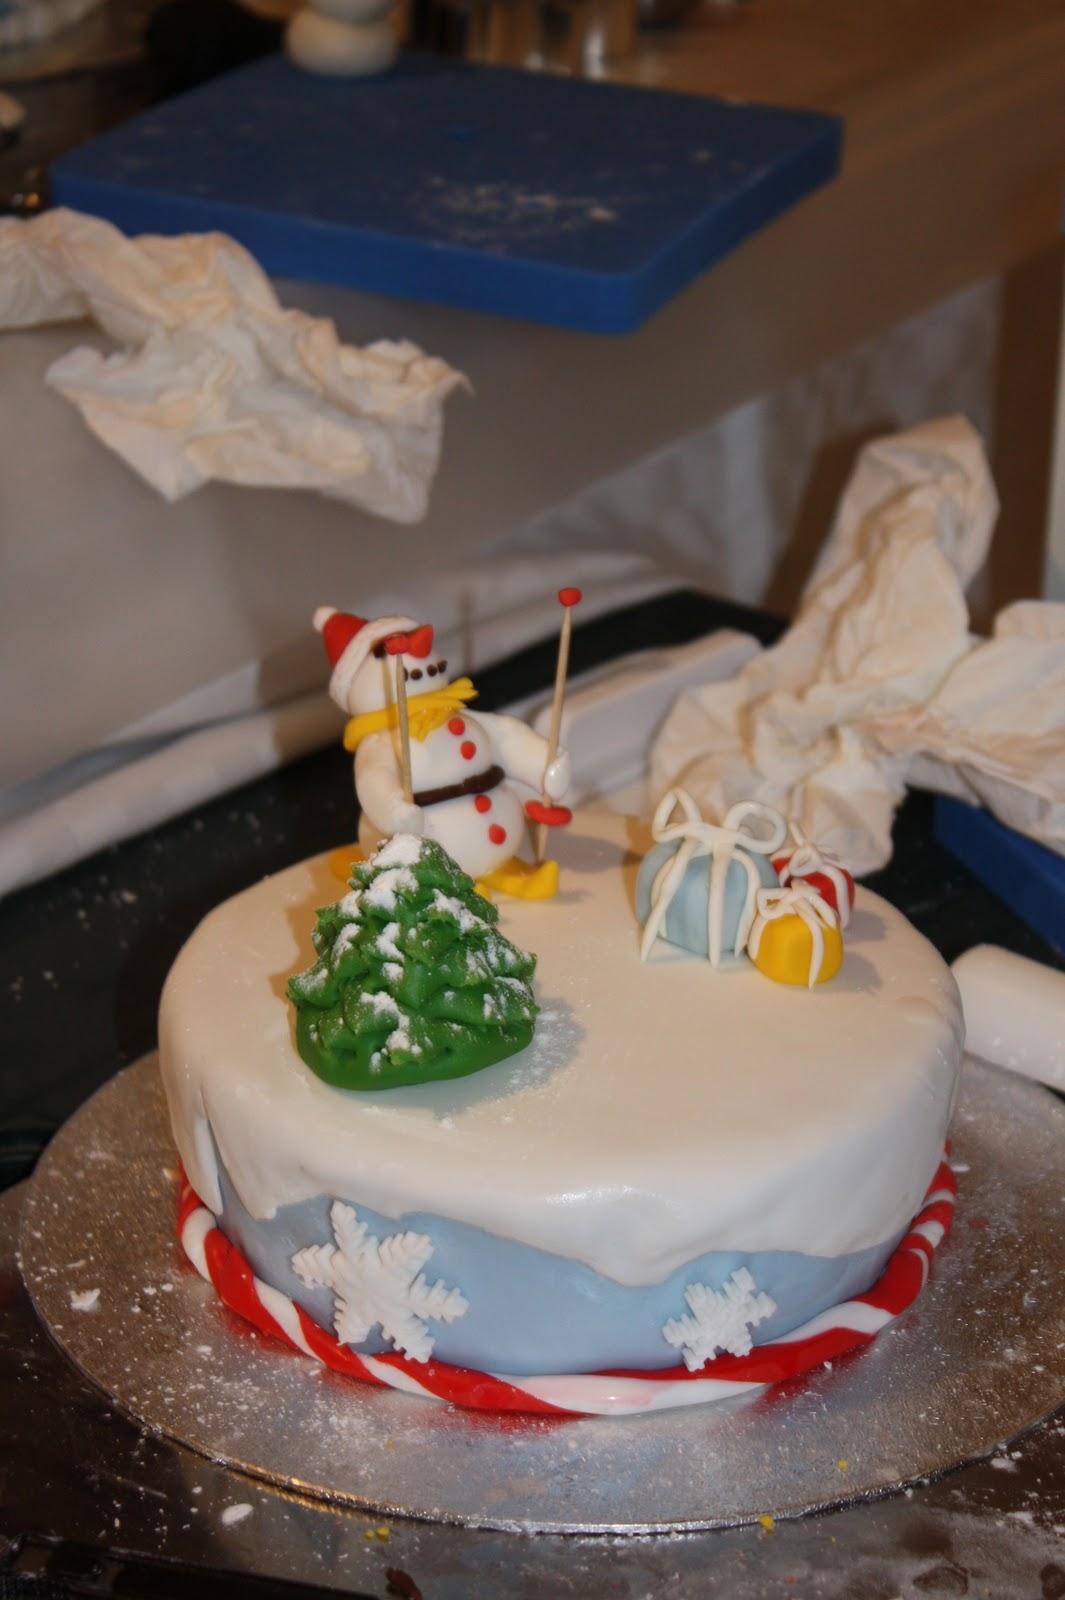 Corso Di Cake Design Roma Groupon : Food Fairies: due fate in cucina: Primo corso di Cake ...